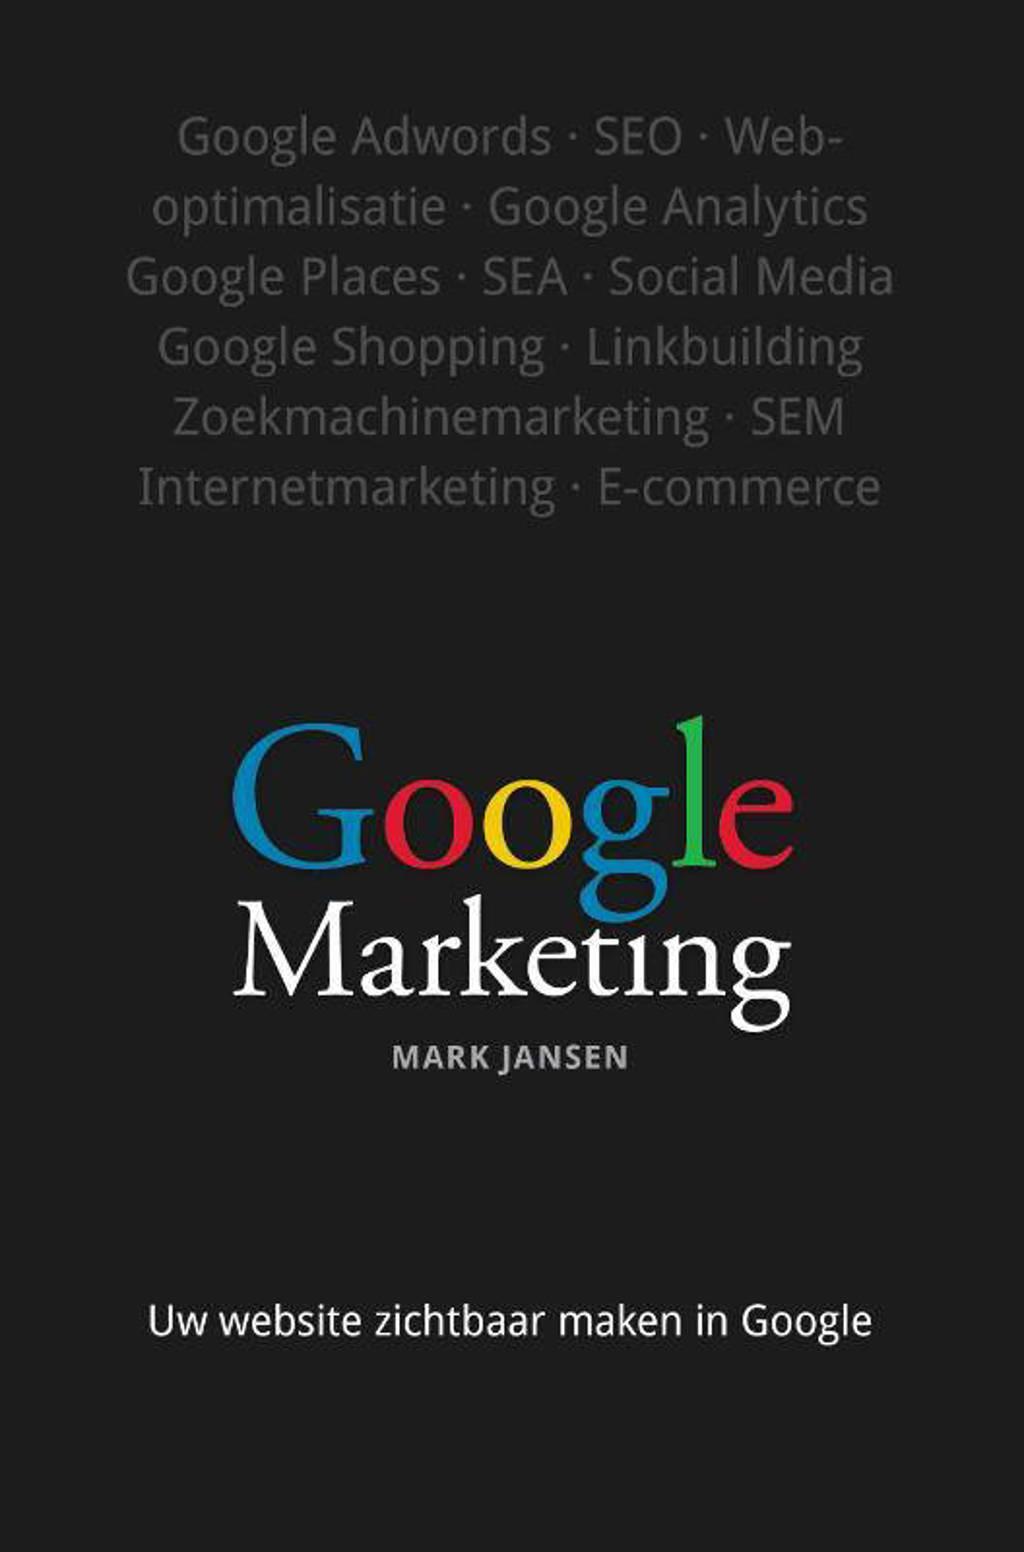 Google Marketing - Mark Jansen